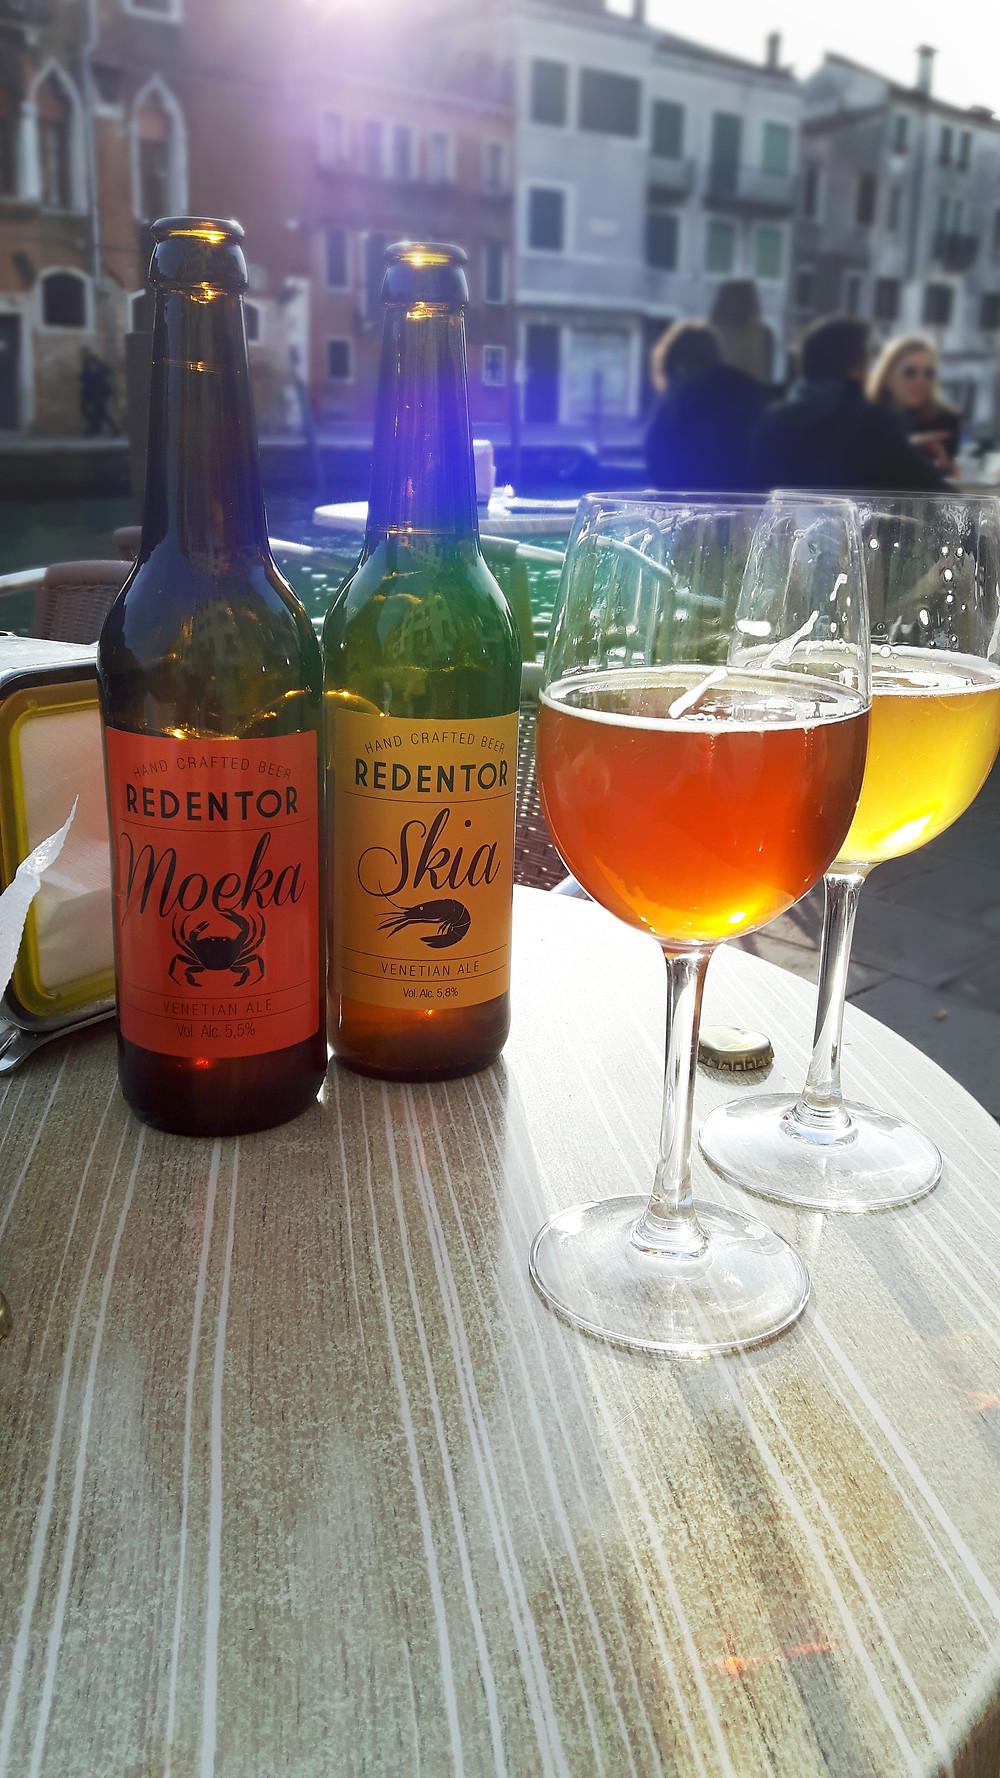 Redentor - locally brewed Venetian ale